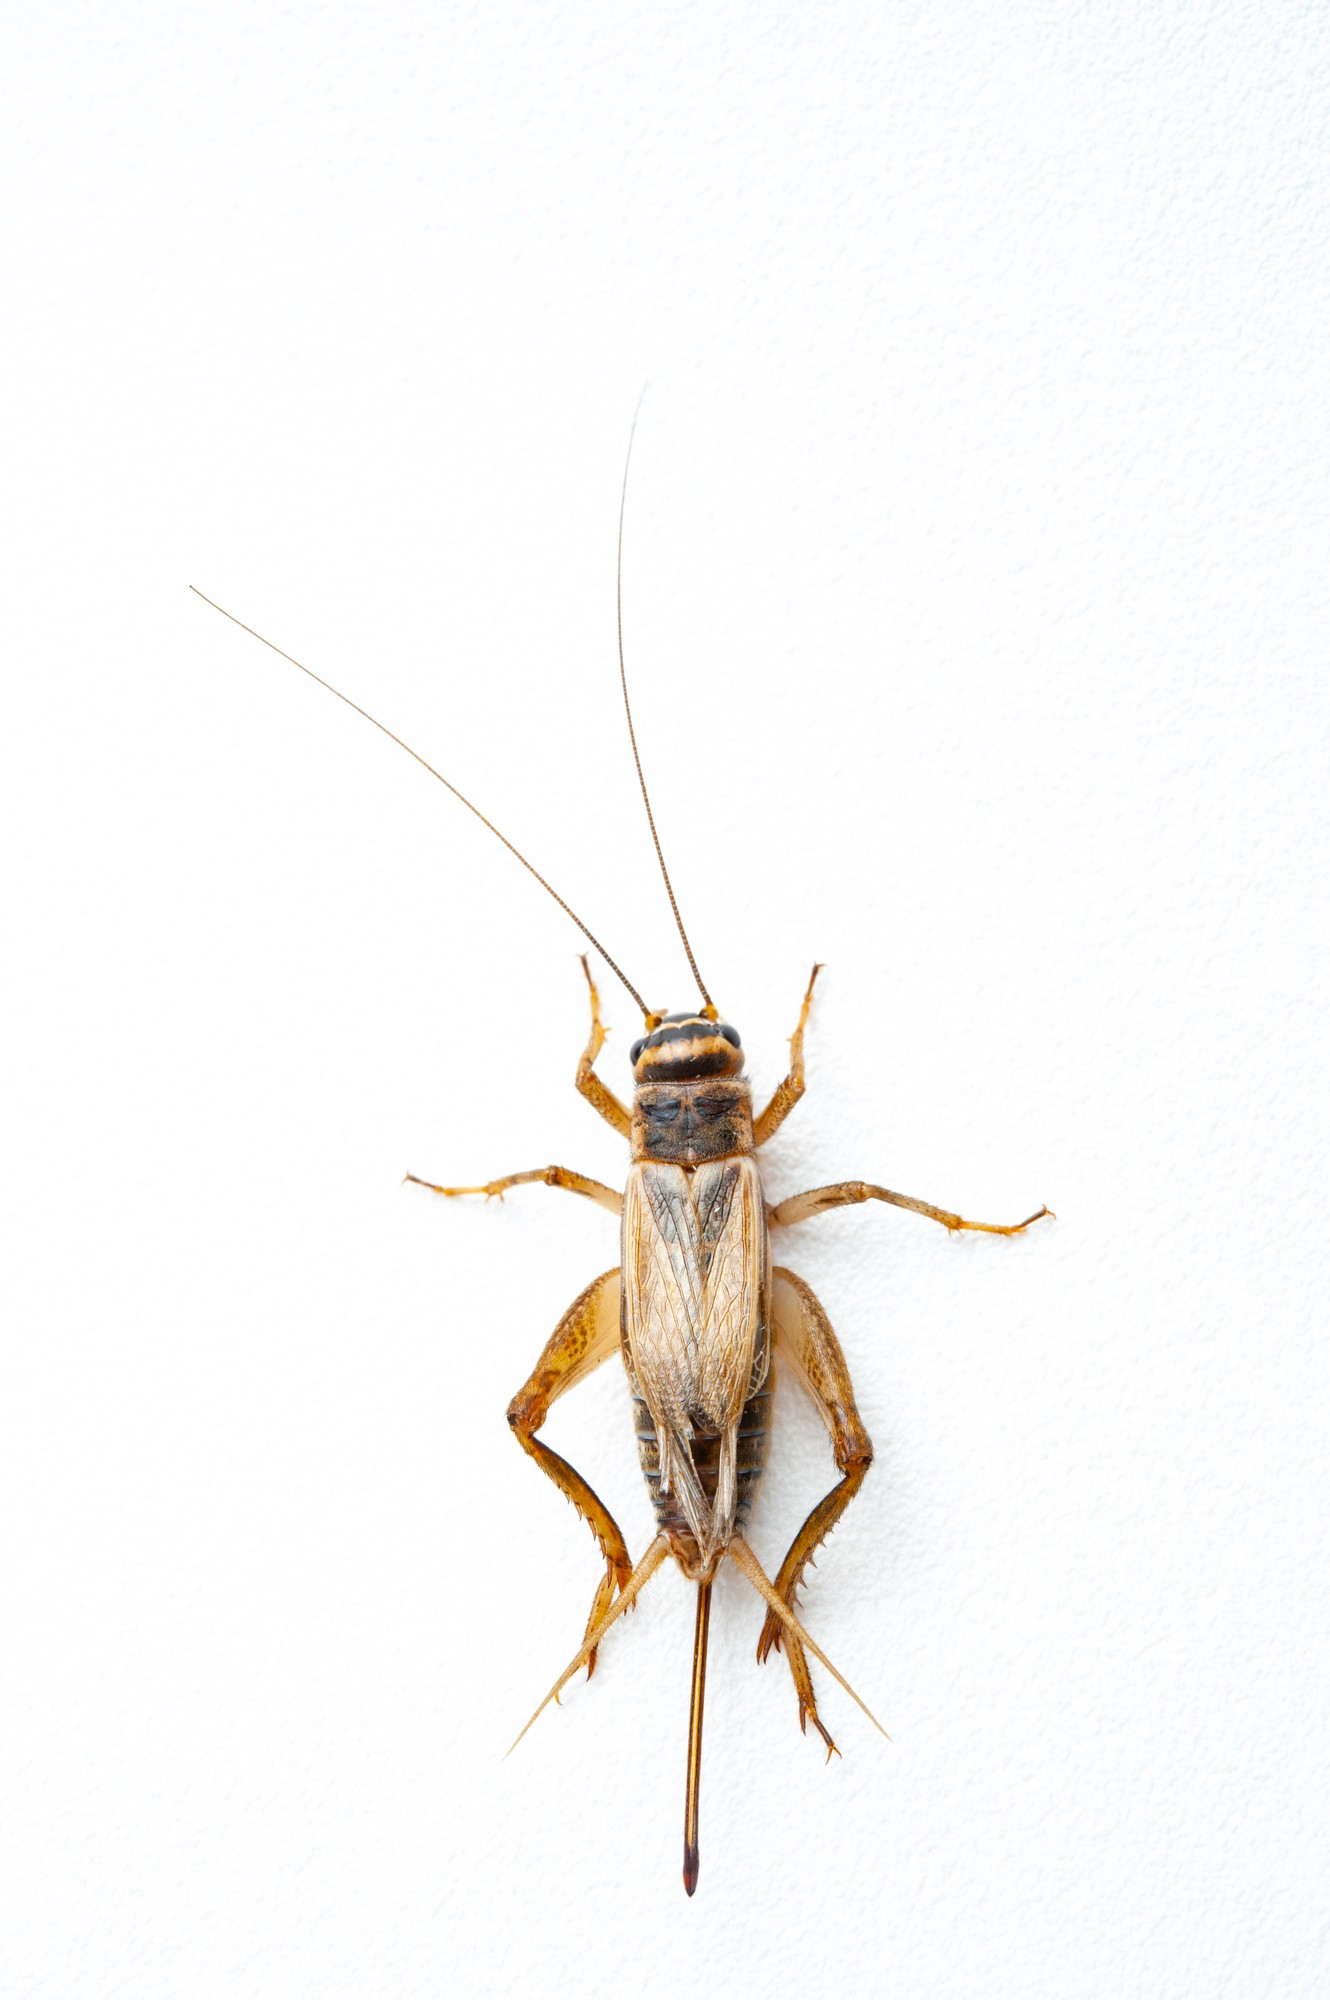 Photo: A common house cricket (Acheta domestica).